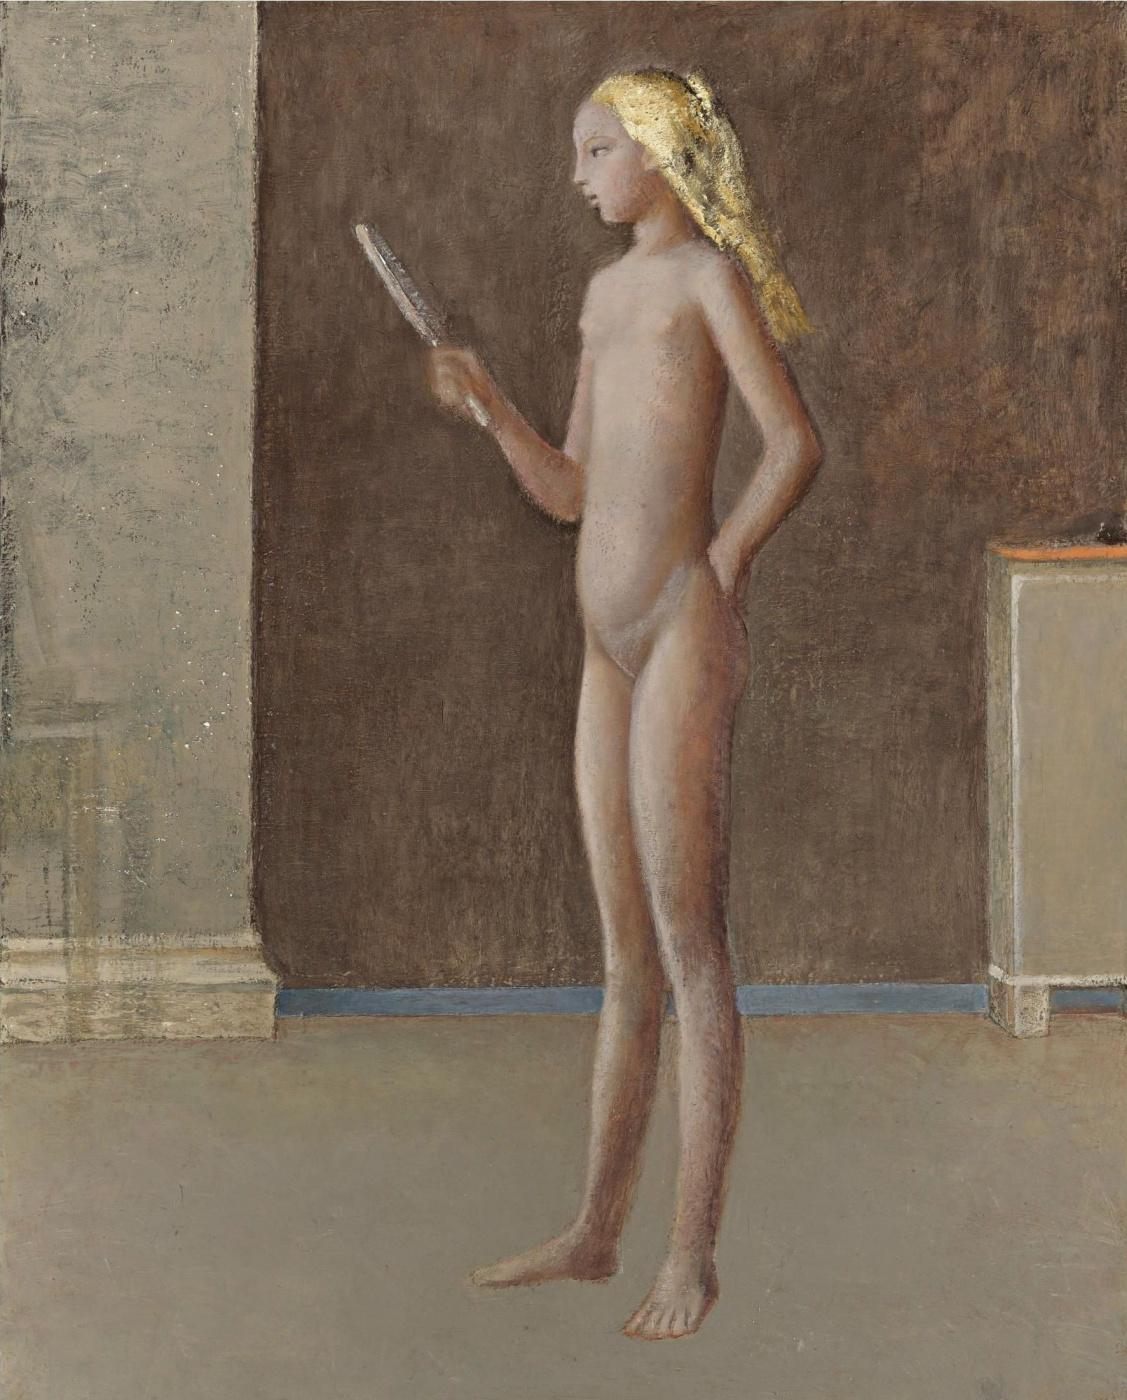 Balthus (Balthasar Klossovsky de Rola). Nude with mirror